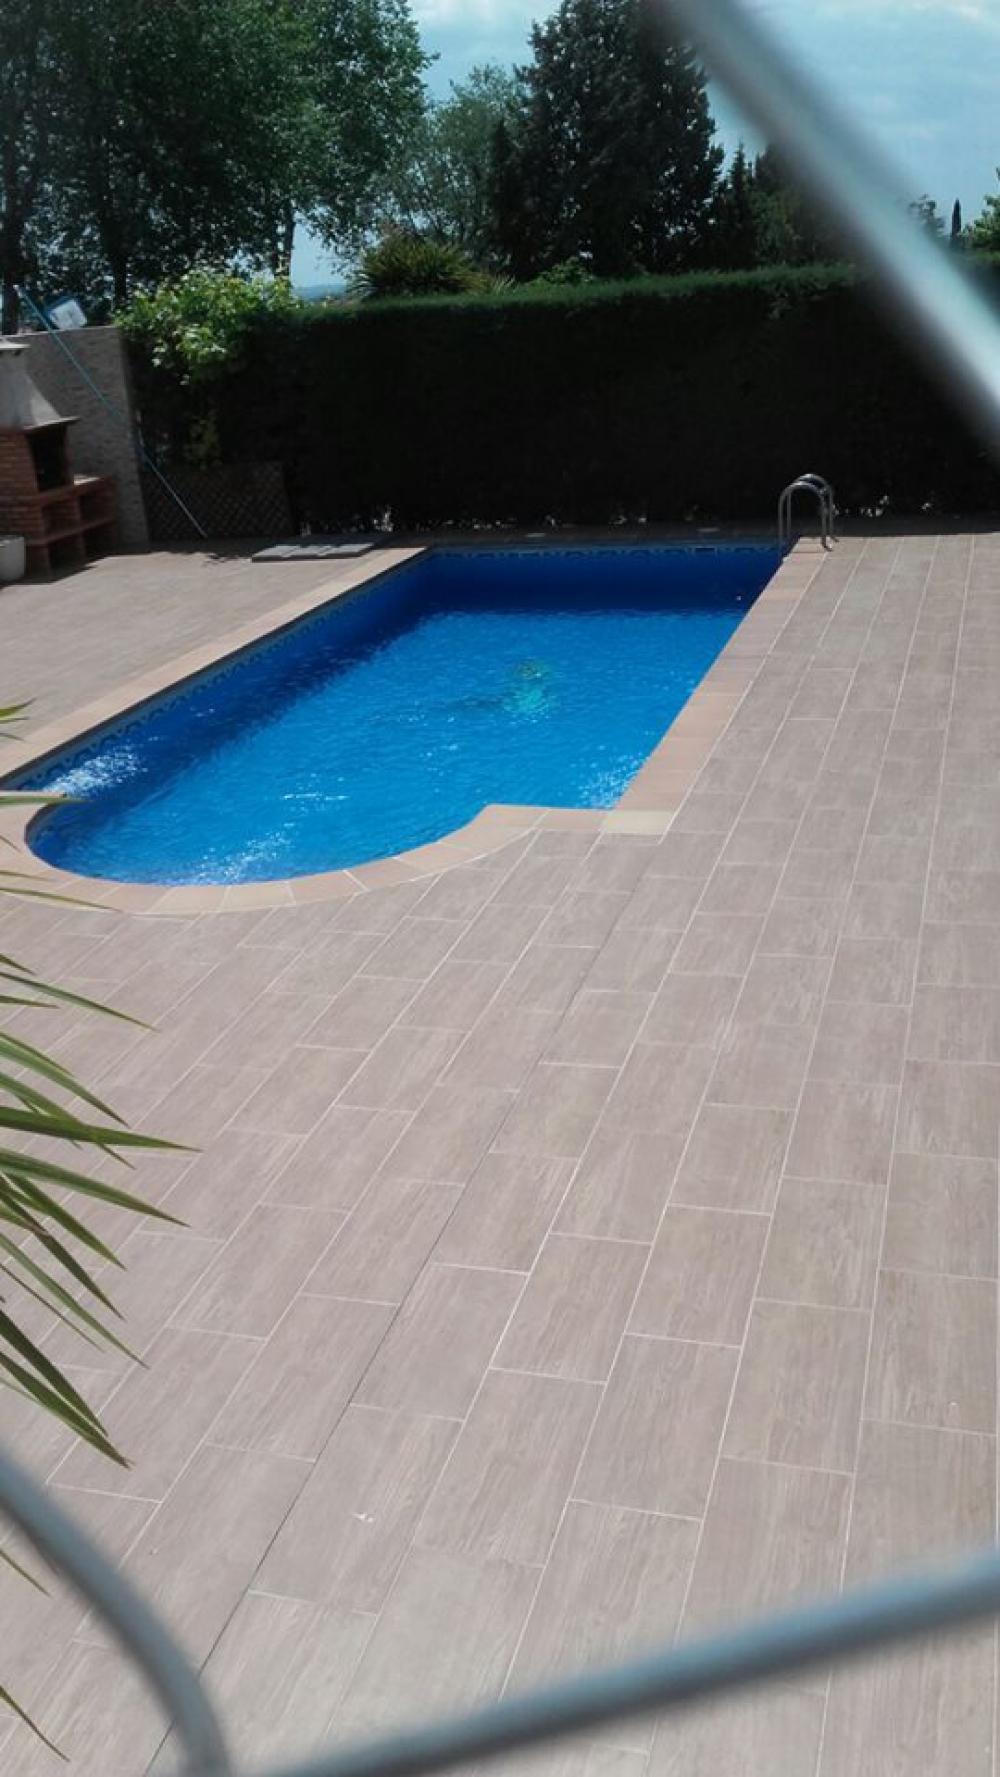 Piscinas de arena madrid piscinas raul with piscinas de for Madrid piscinas